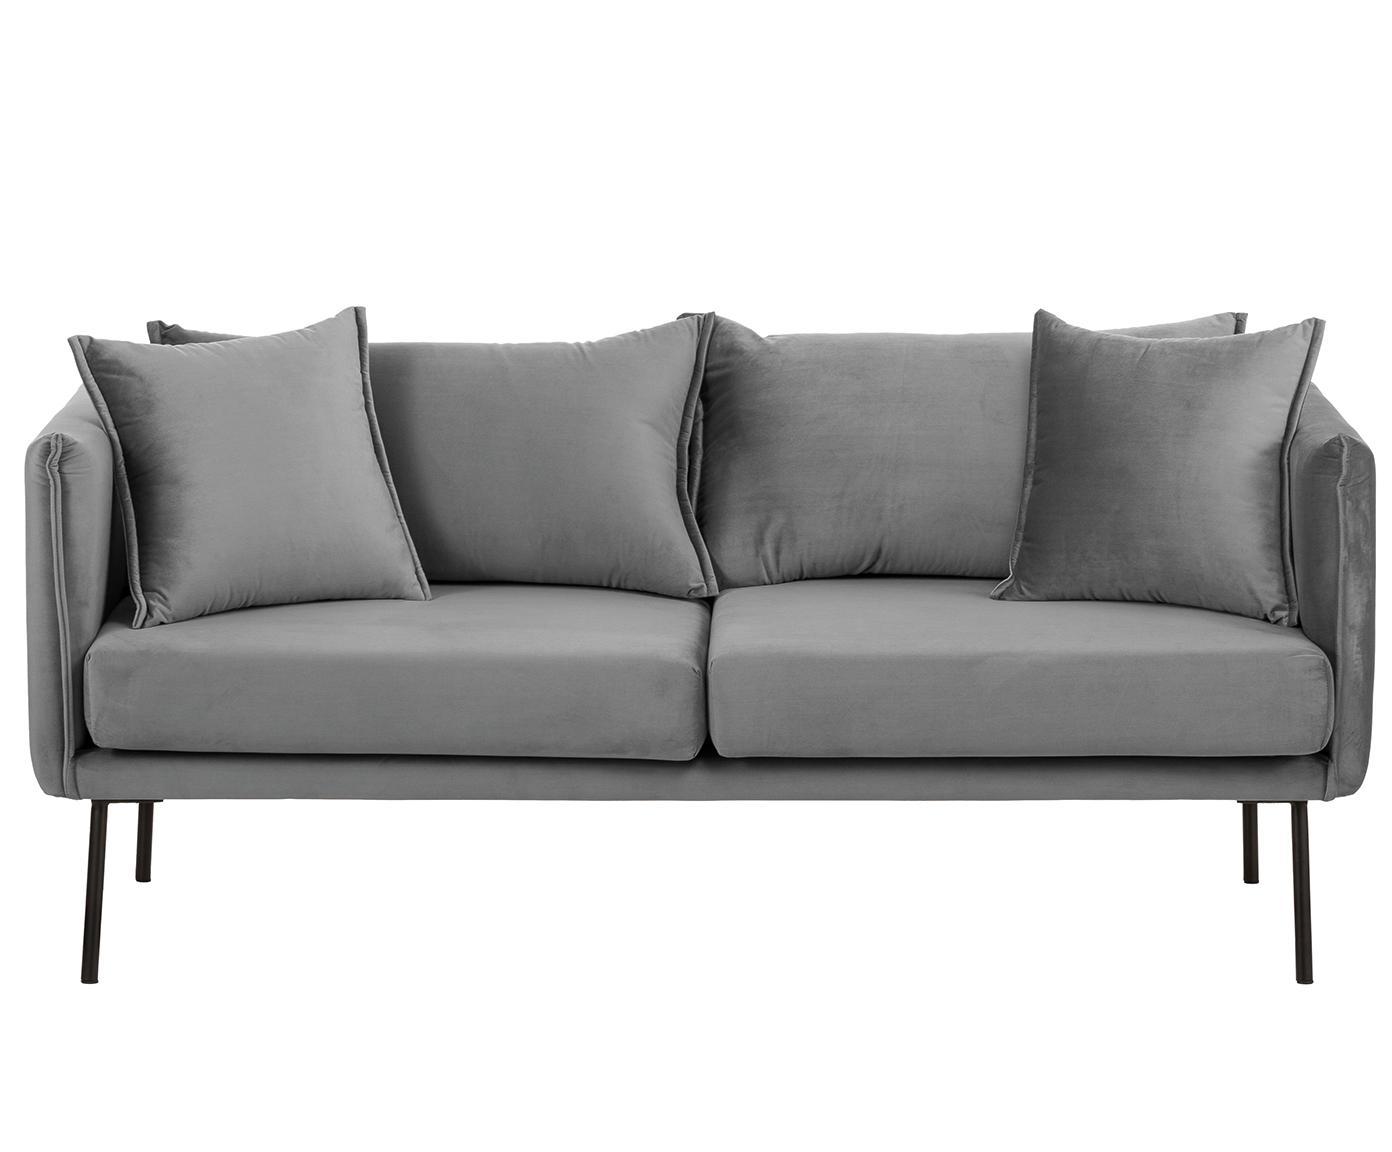 Samt-Sofa Ivy (2-Sitzer), Bezug: Samt (Polyester) 15.000 S, Gestell: Metall, Füße: Metall, pulverbeschichtet, Samt Grau, B 170 x T 75 cm